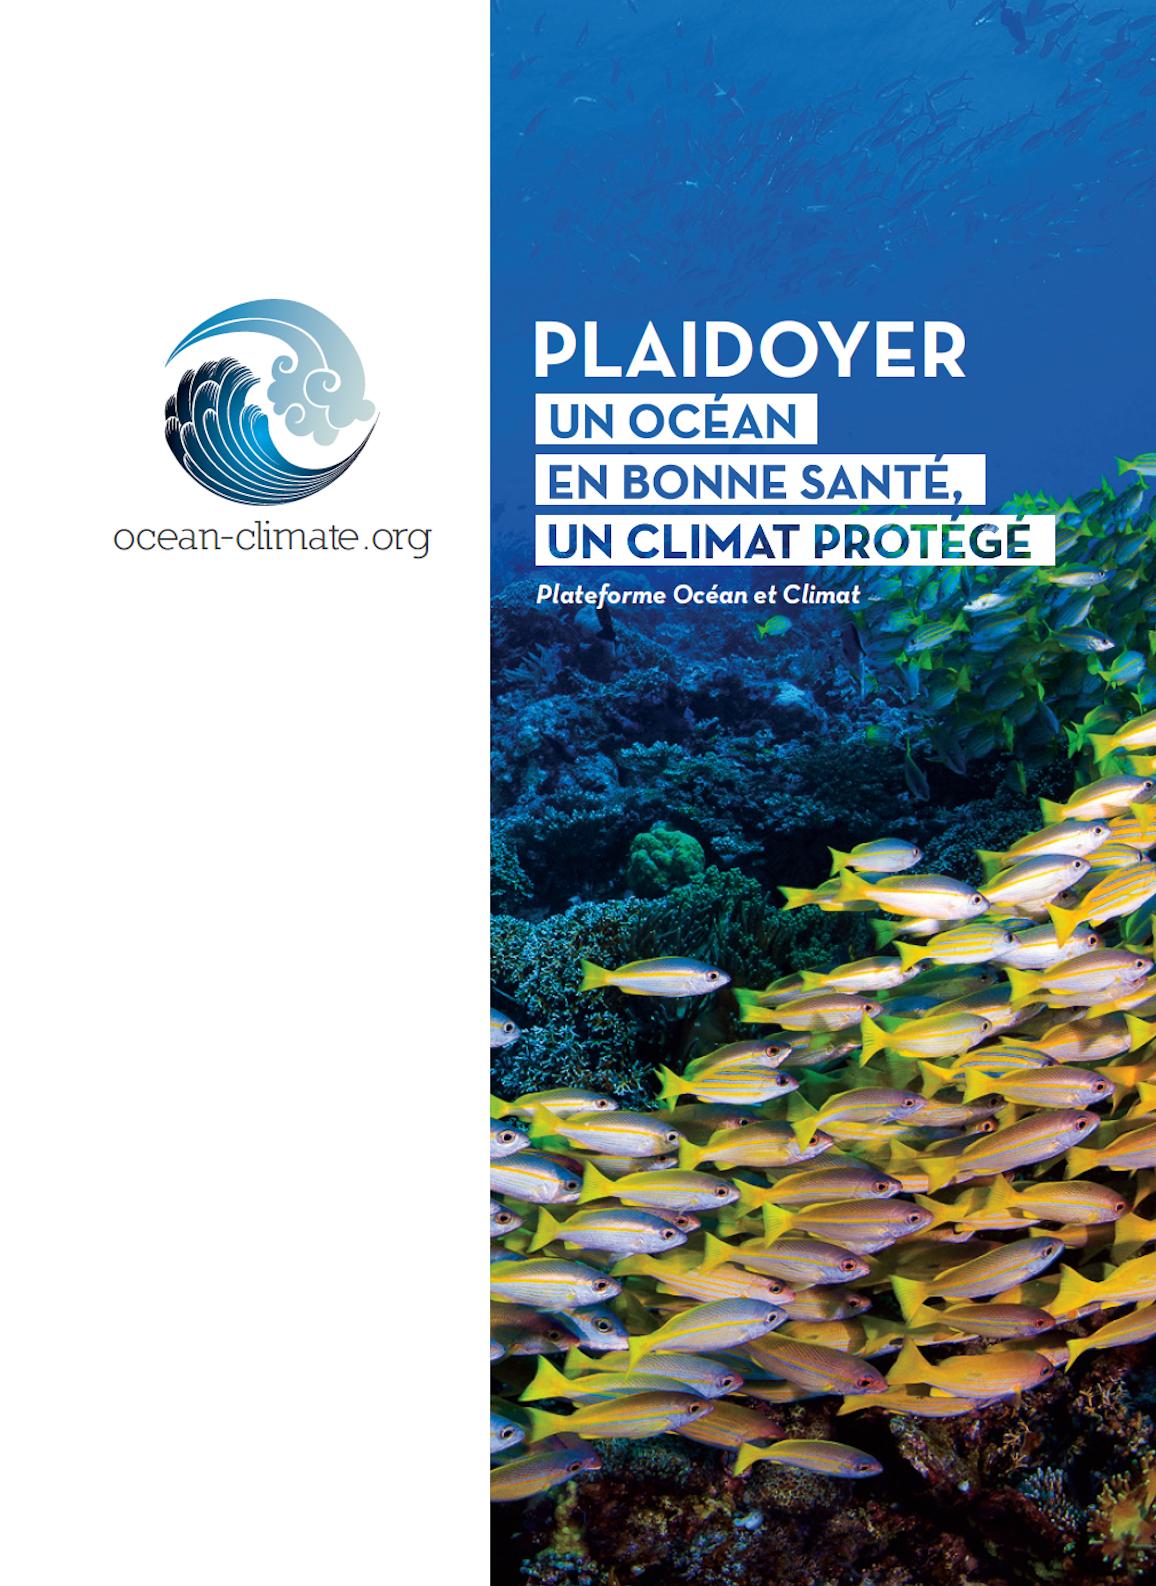 Plaidoyer 2019 Plateforme Océan et Climat